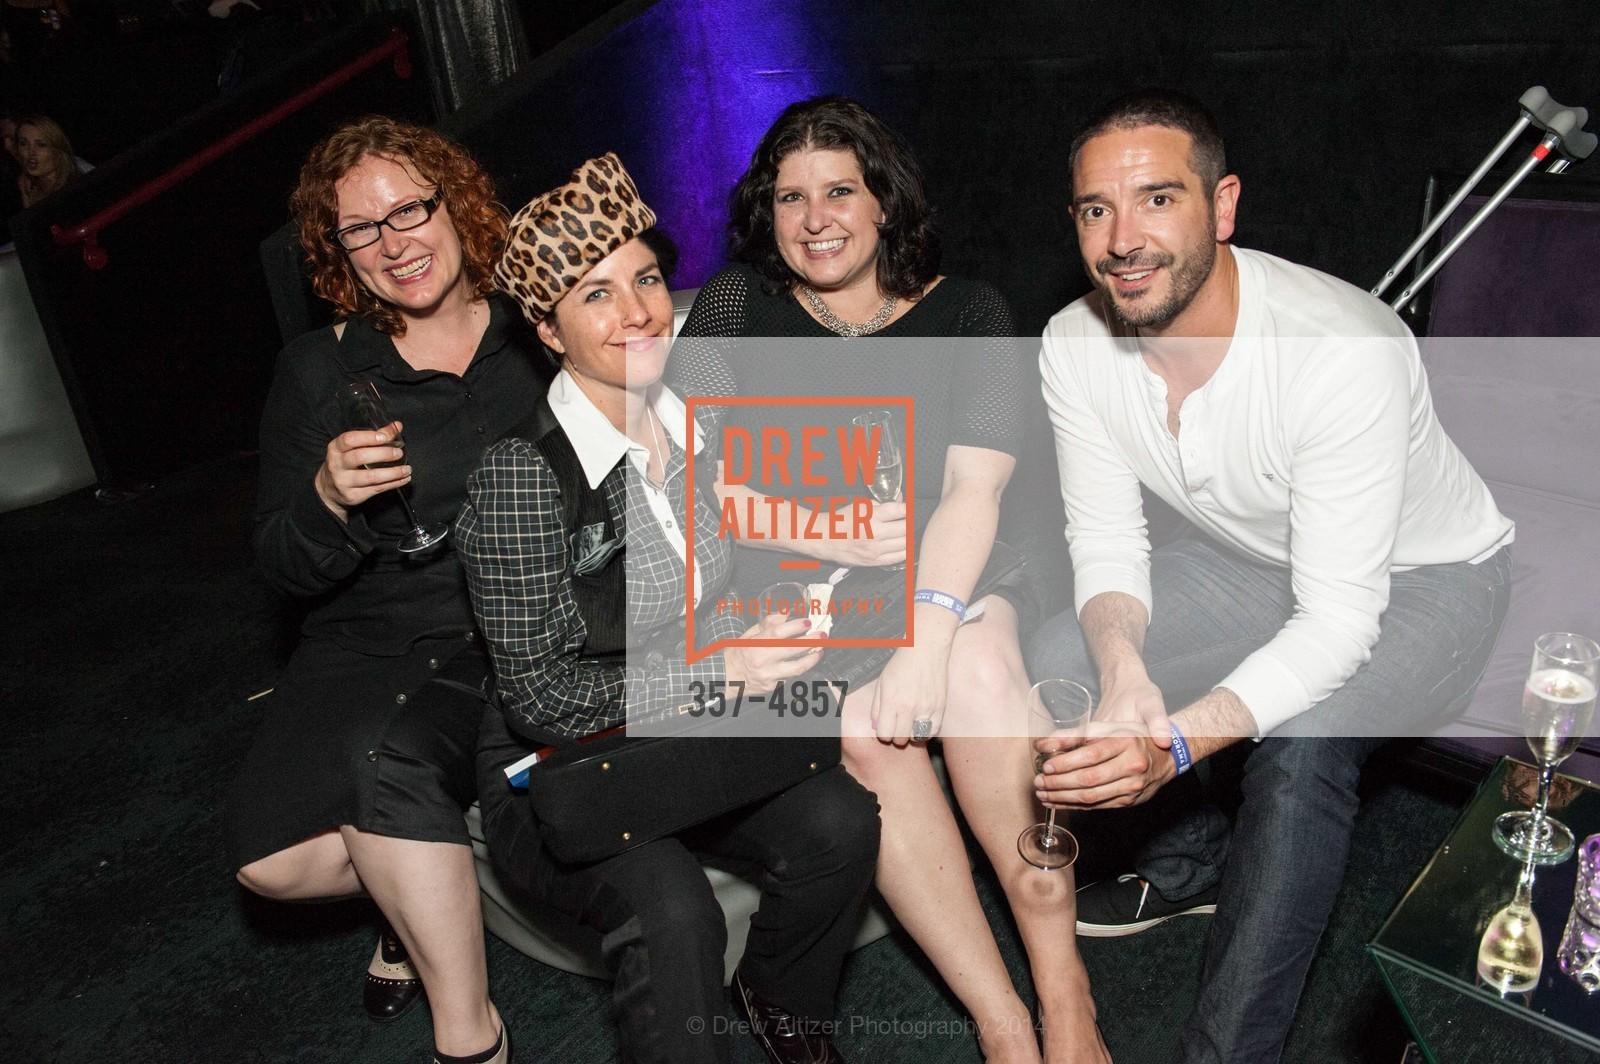 Kyra, Bree Hylkema, Elaine Blunt, Jason Bellow, Photo #357-4857